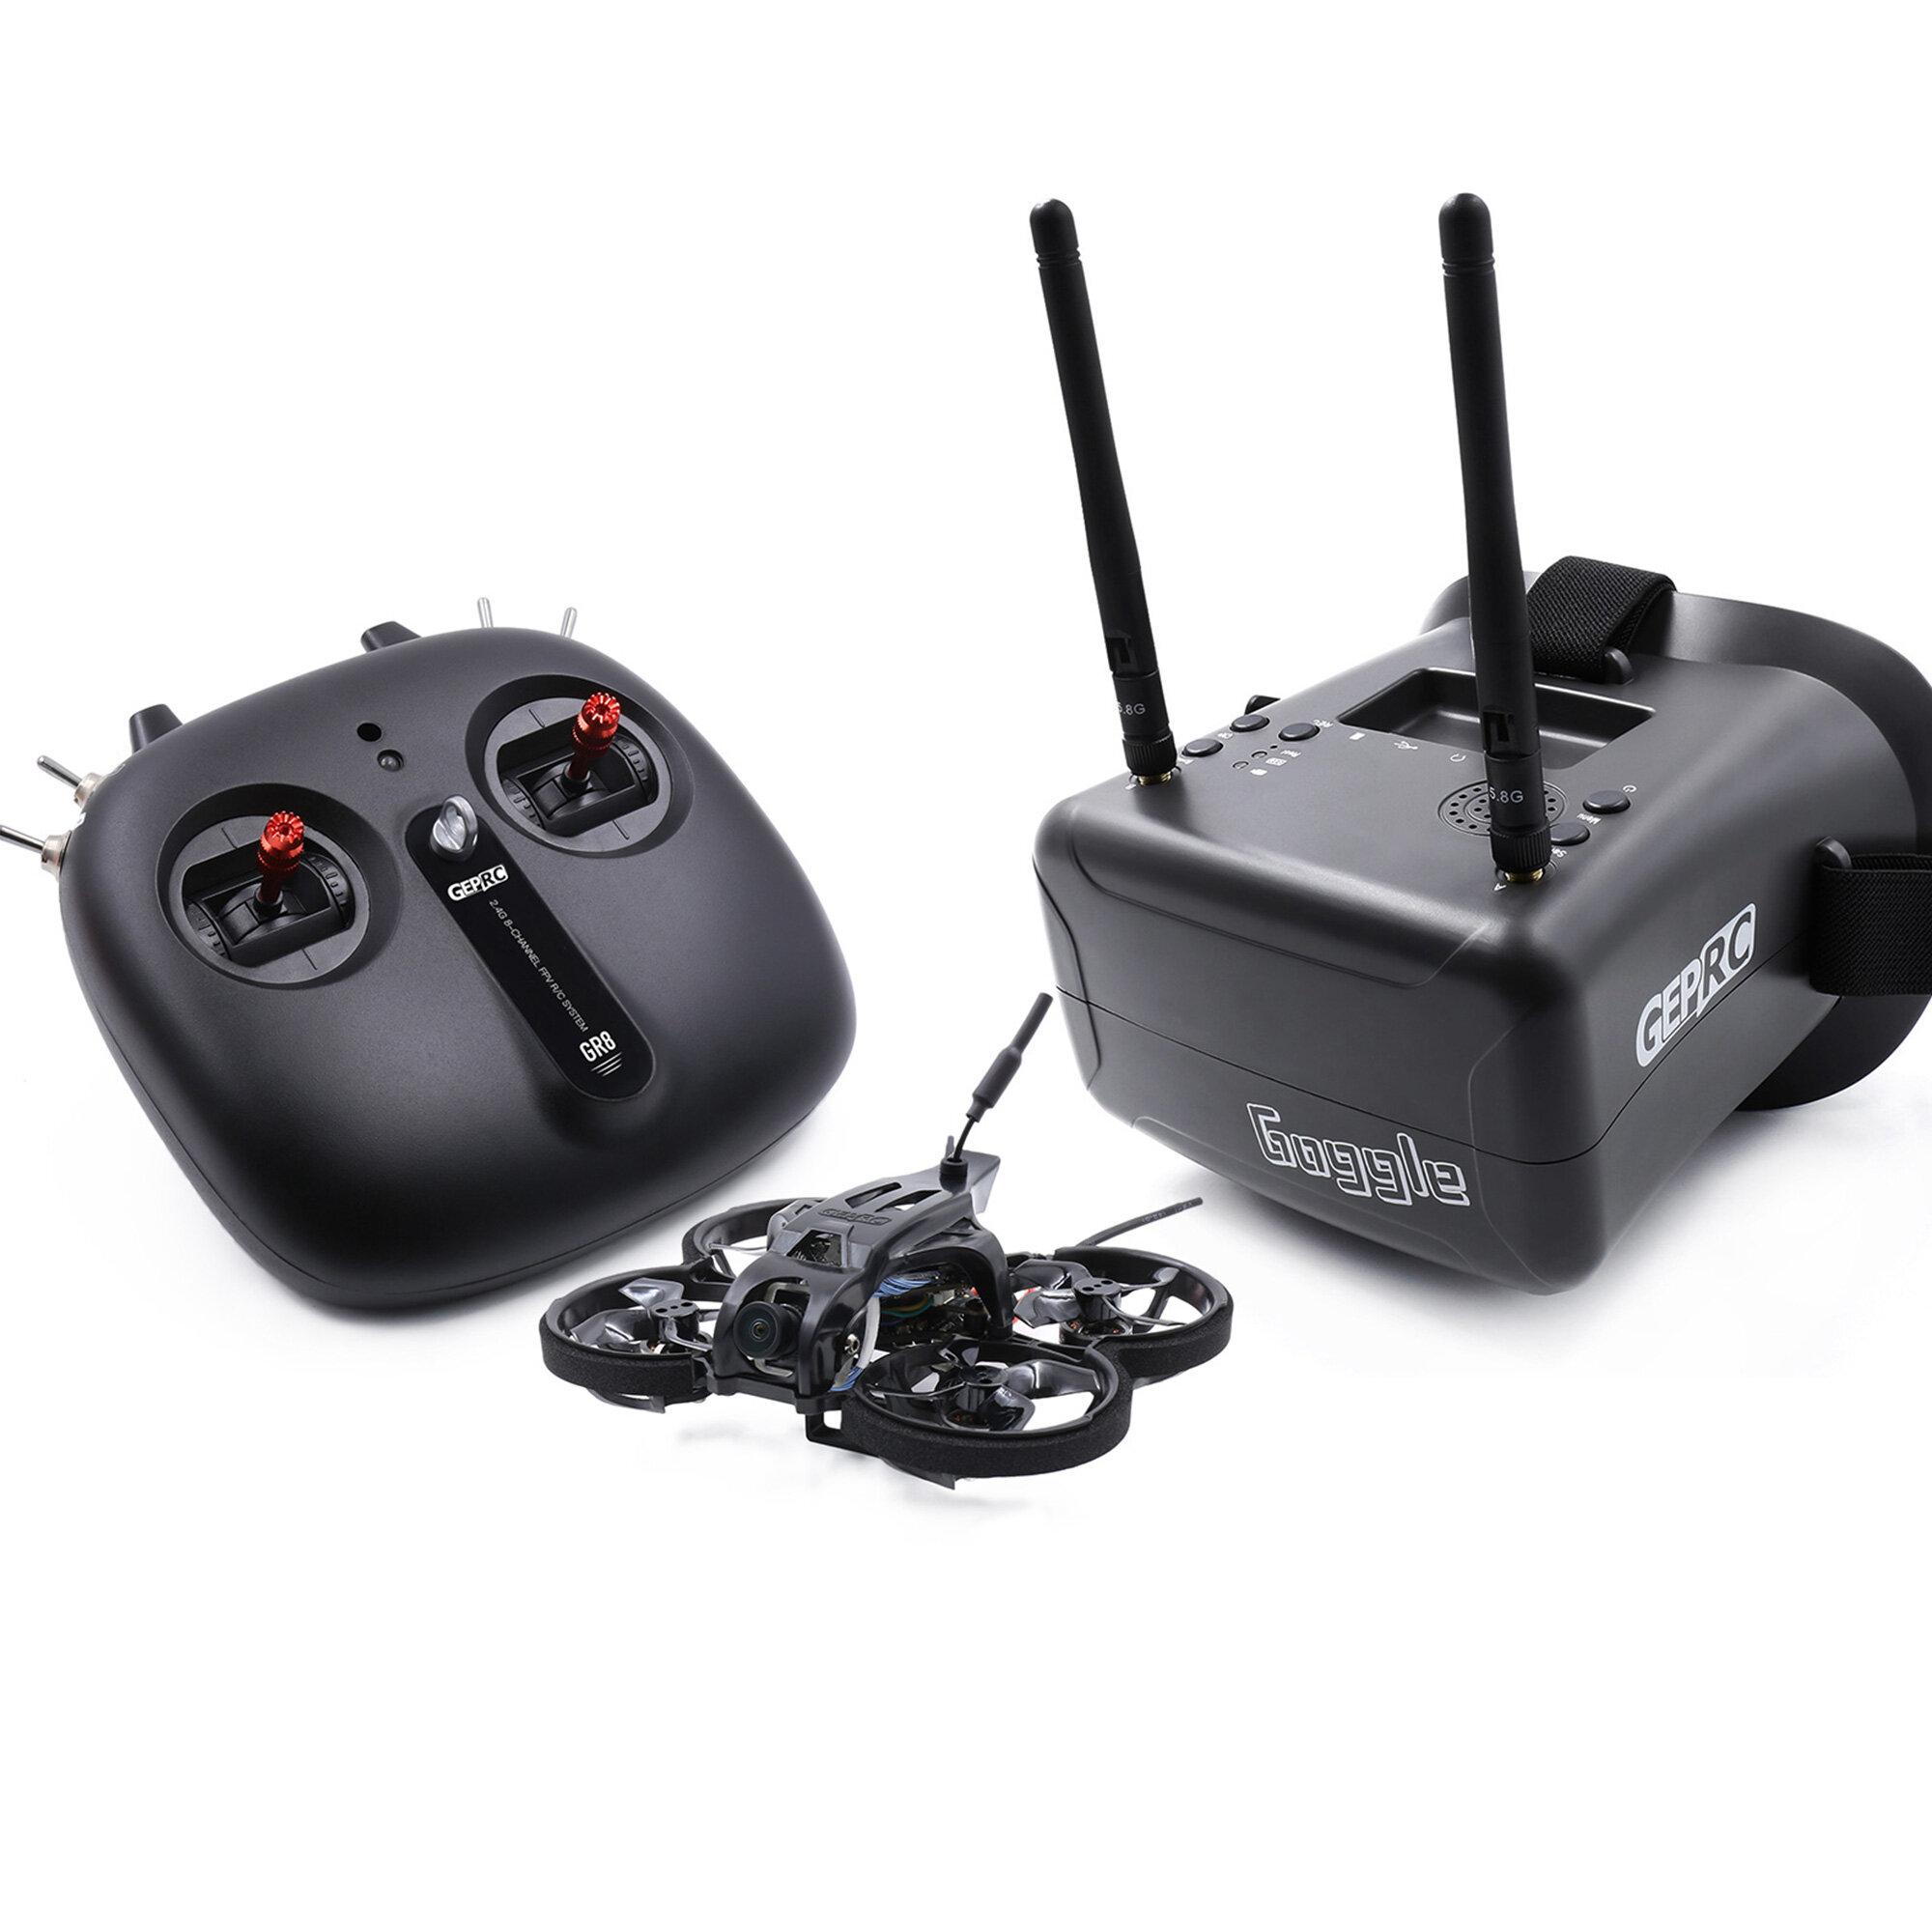 Banggood coupon: GEPRC TinyGO 1.6inch 2S 4K Caddx Loris FPV Indoor Whoop + GR8 remoto Controlador + RG1 Goggles RTF pronto para voar FPV